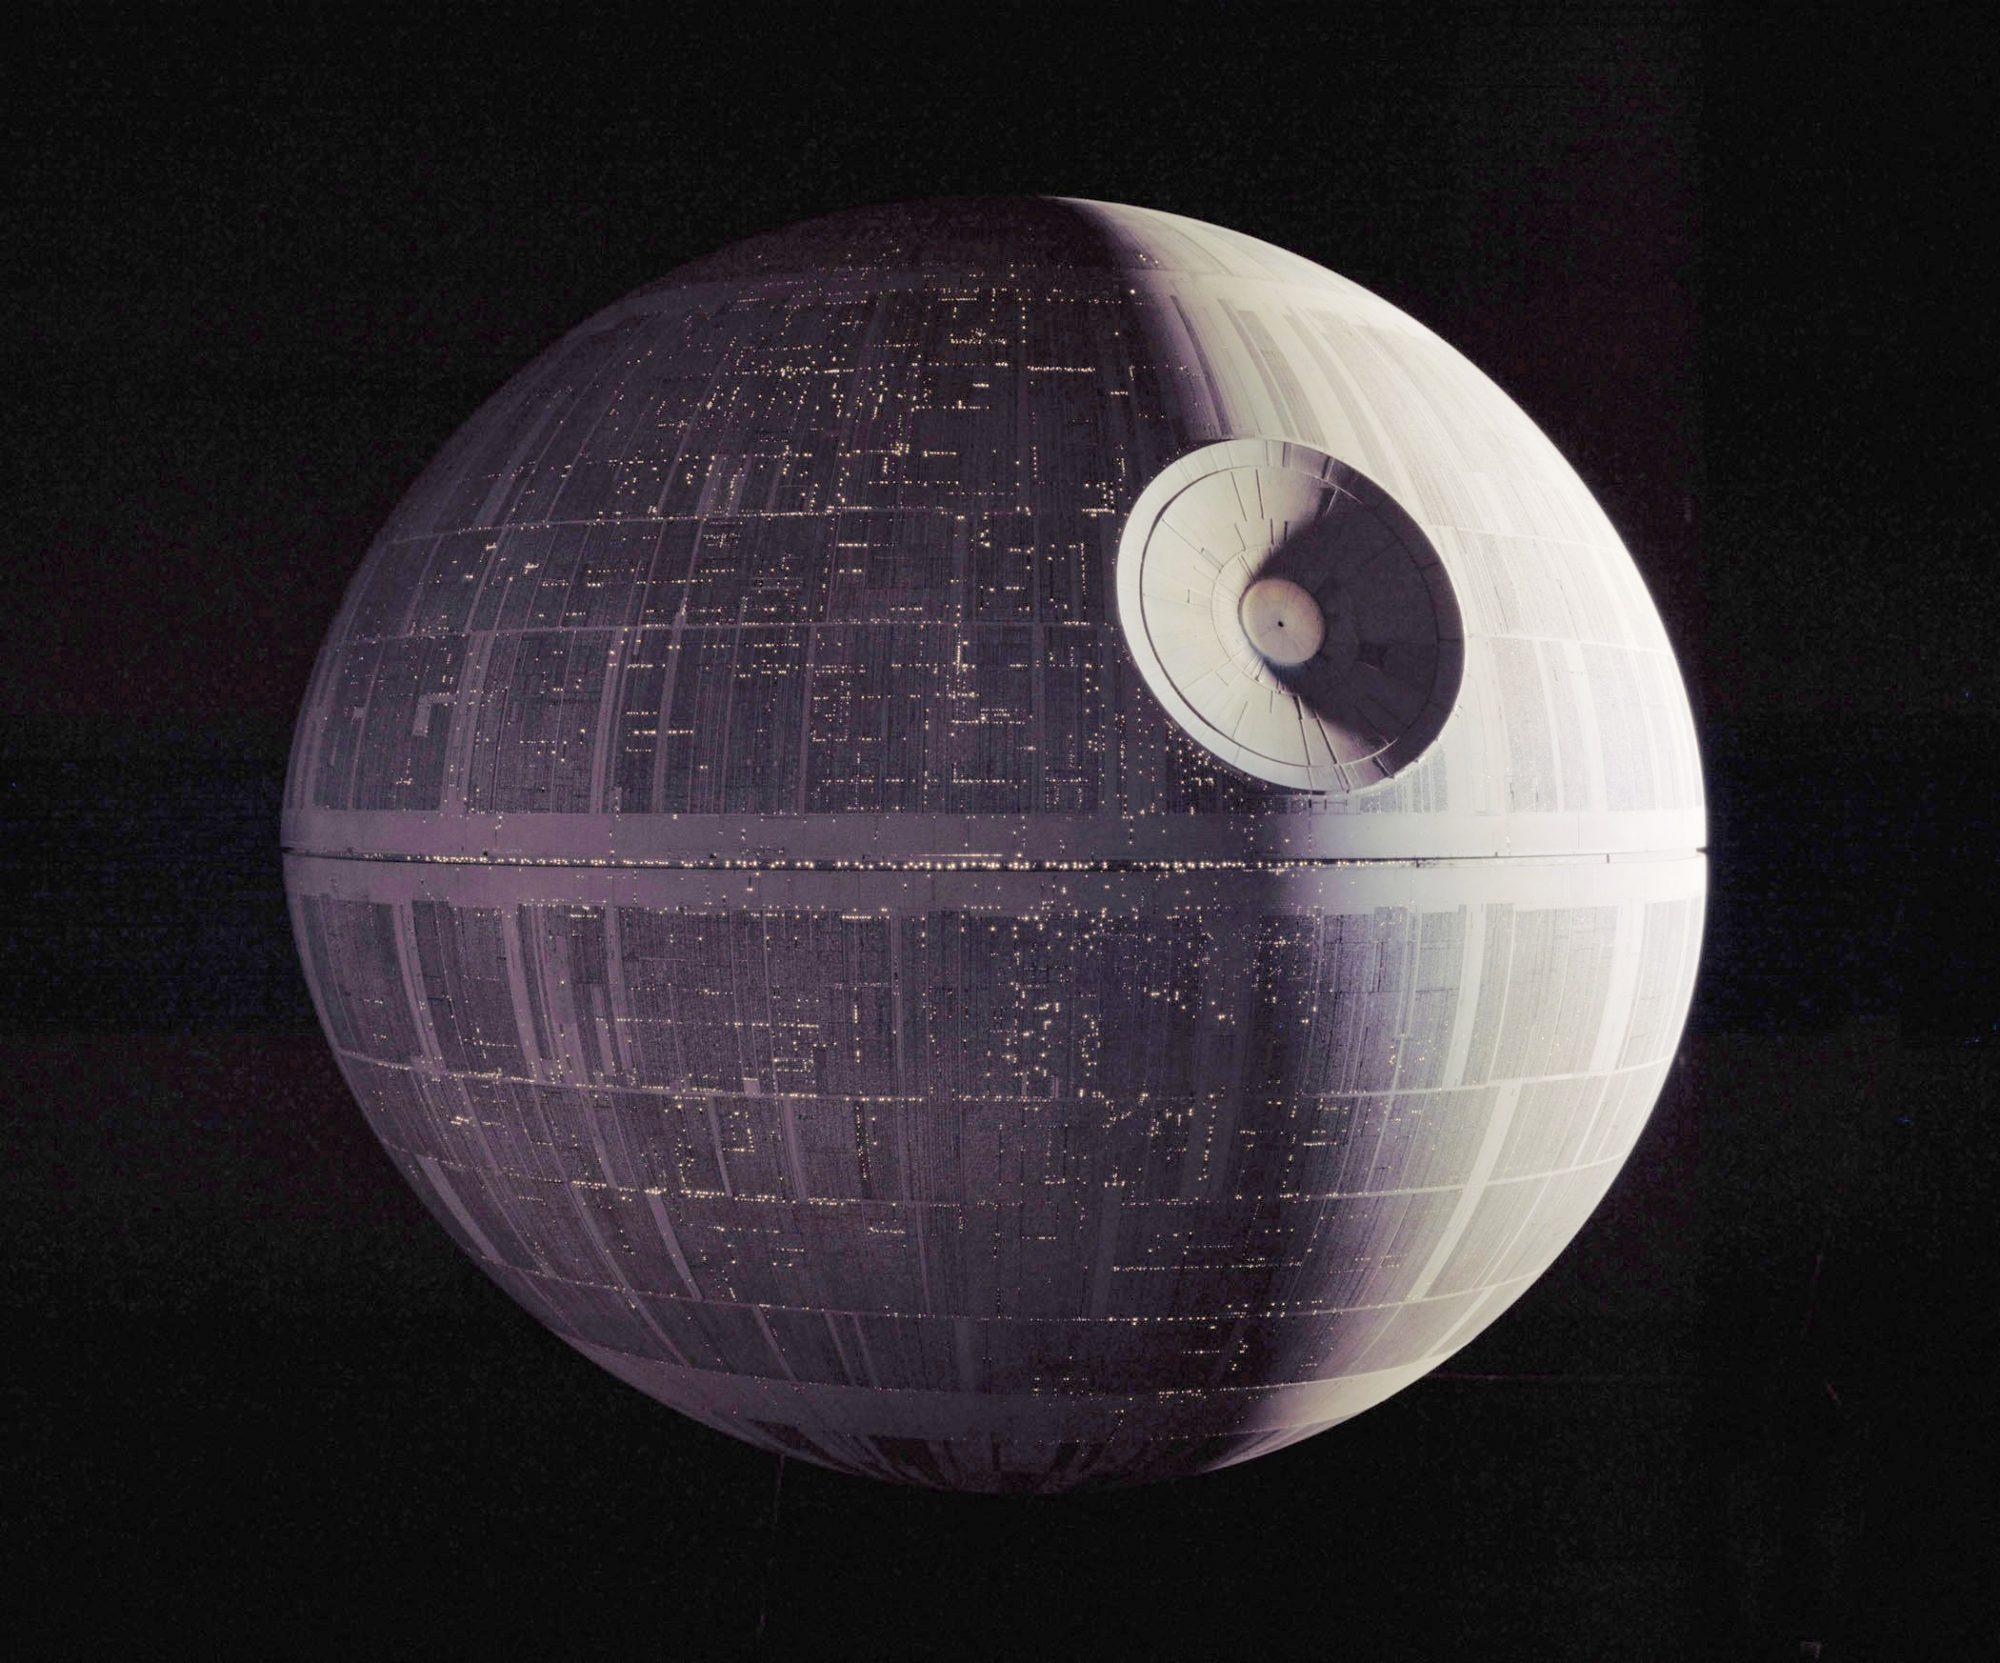 Star Wars: Episode IV - A New HopeDeath Star